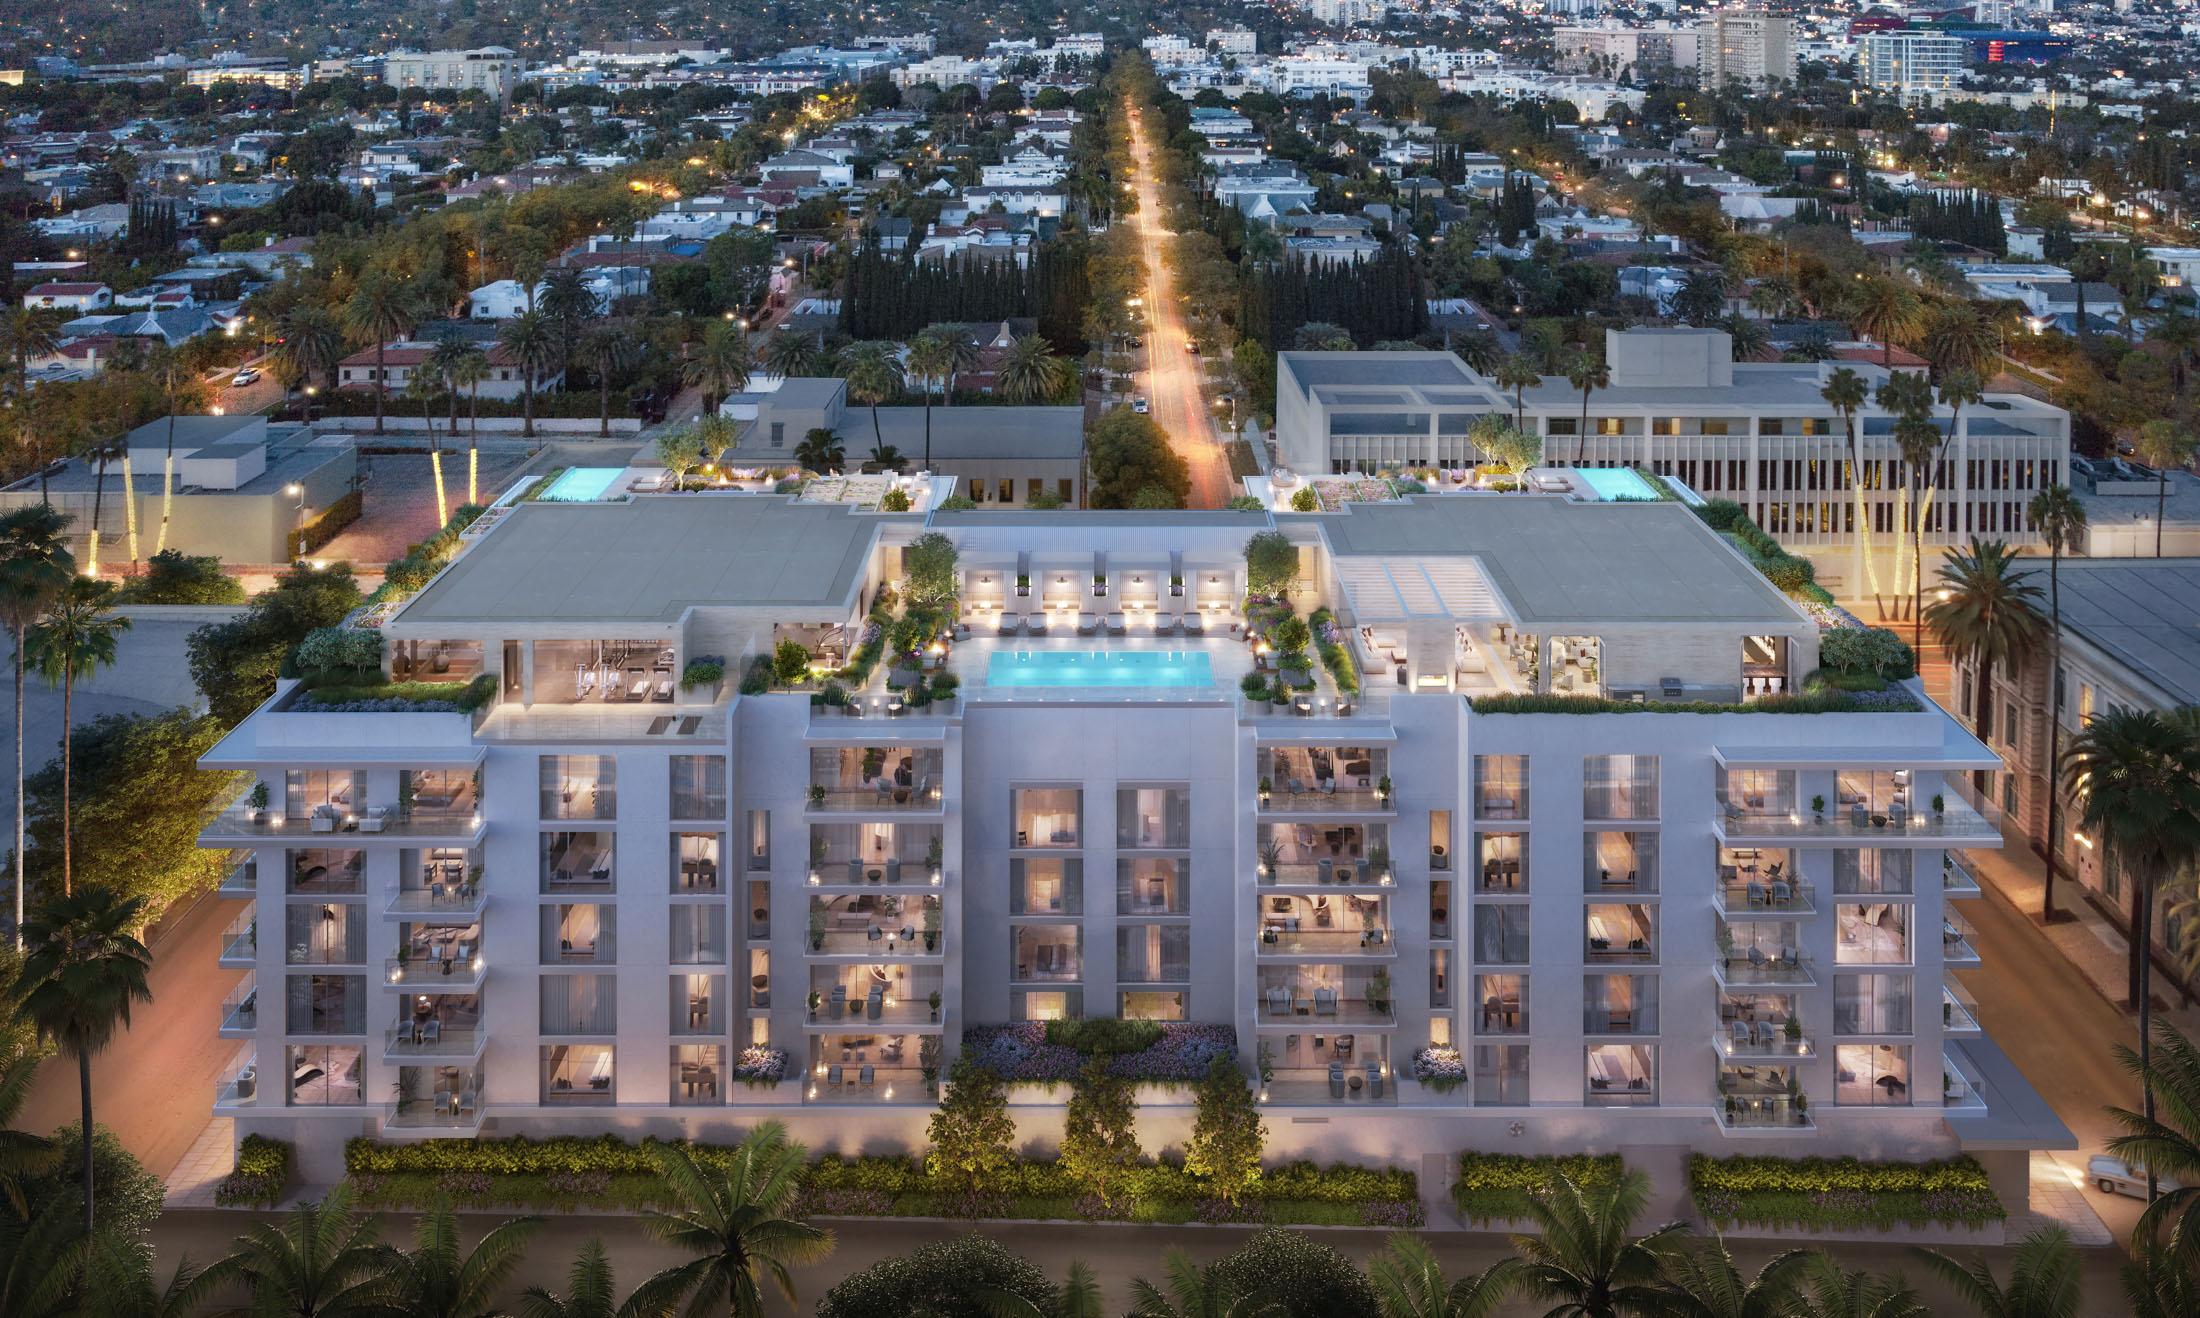 Mandarin Oriental tem 54 apartamentos à venda